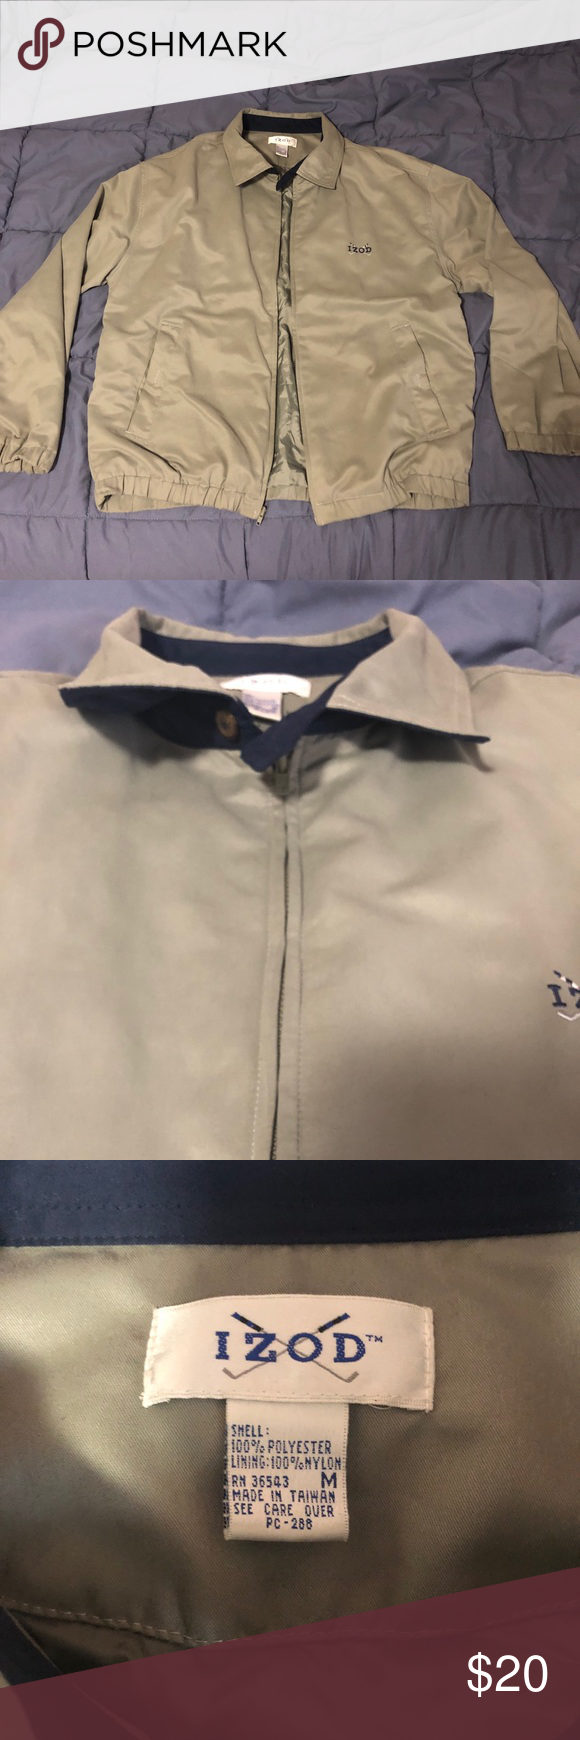 Vintage Izod Golf Jacket In 2020 Jackets Golf Jackets Izod [ 1740 x 580 Pixel ]